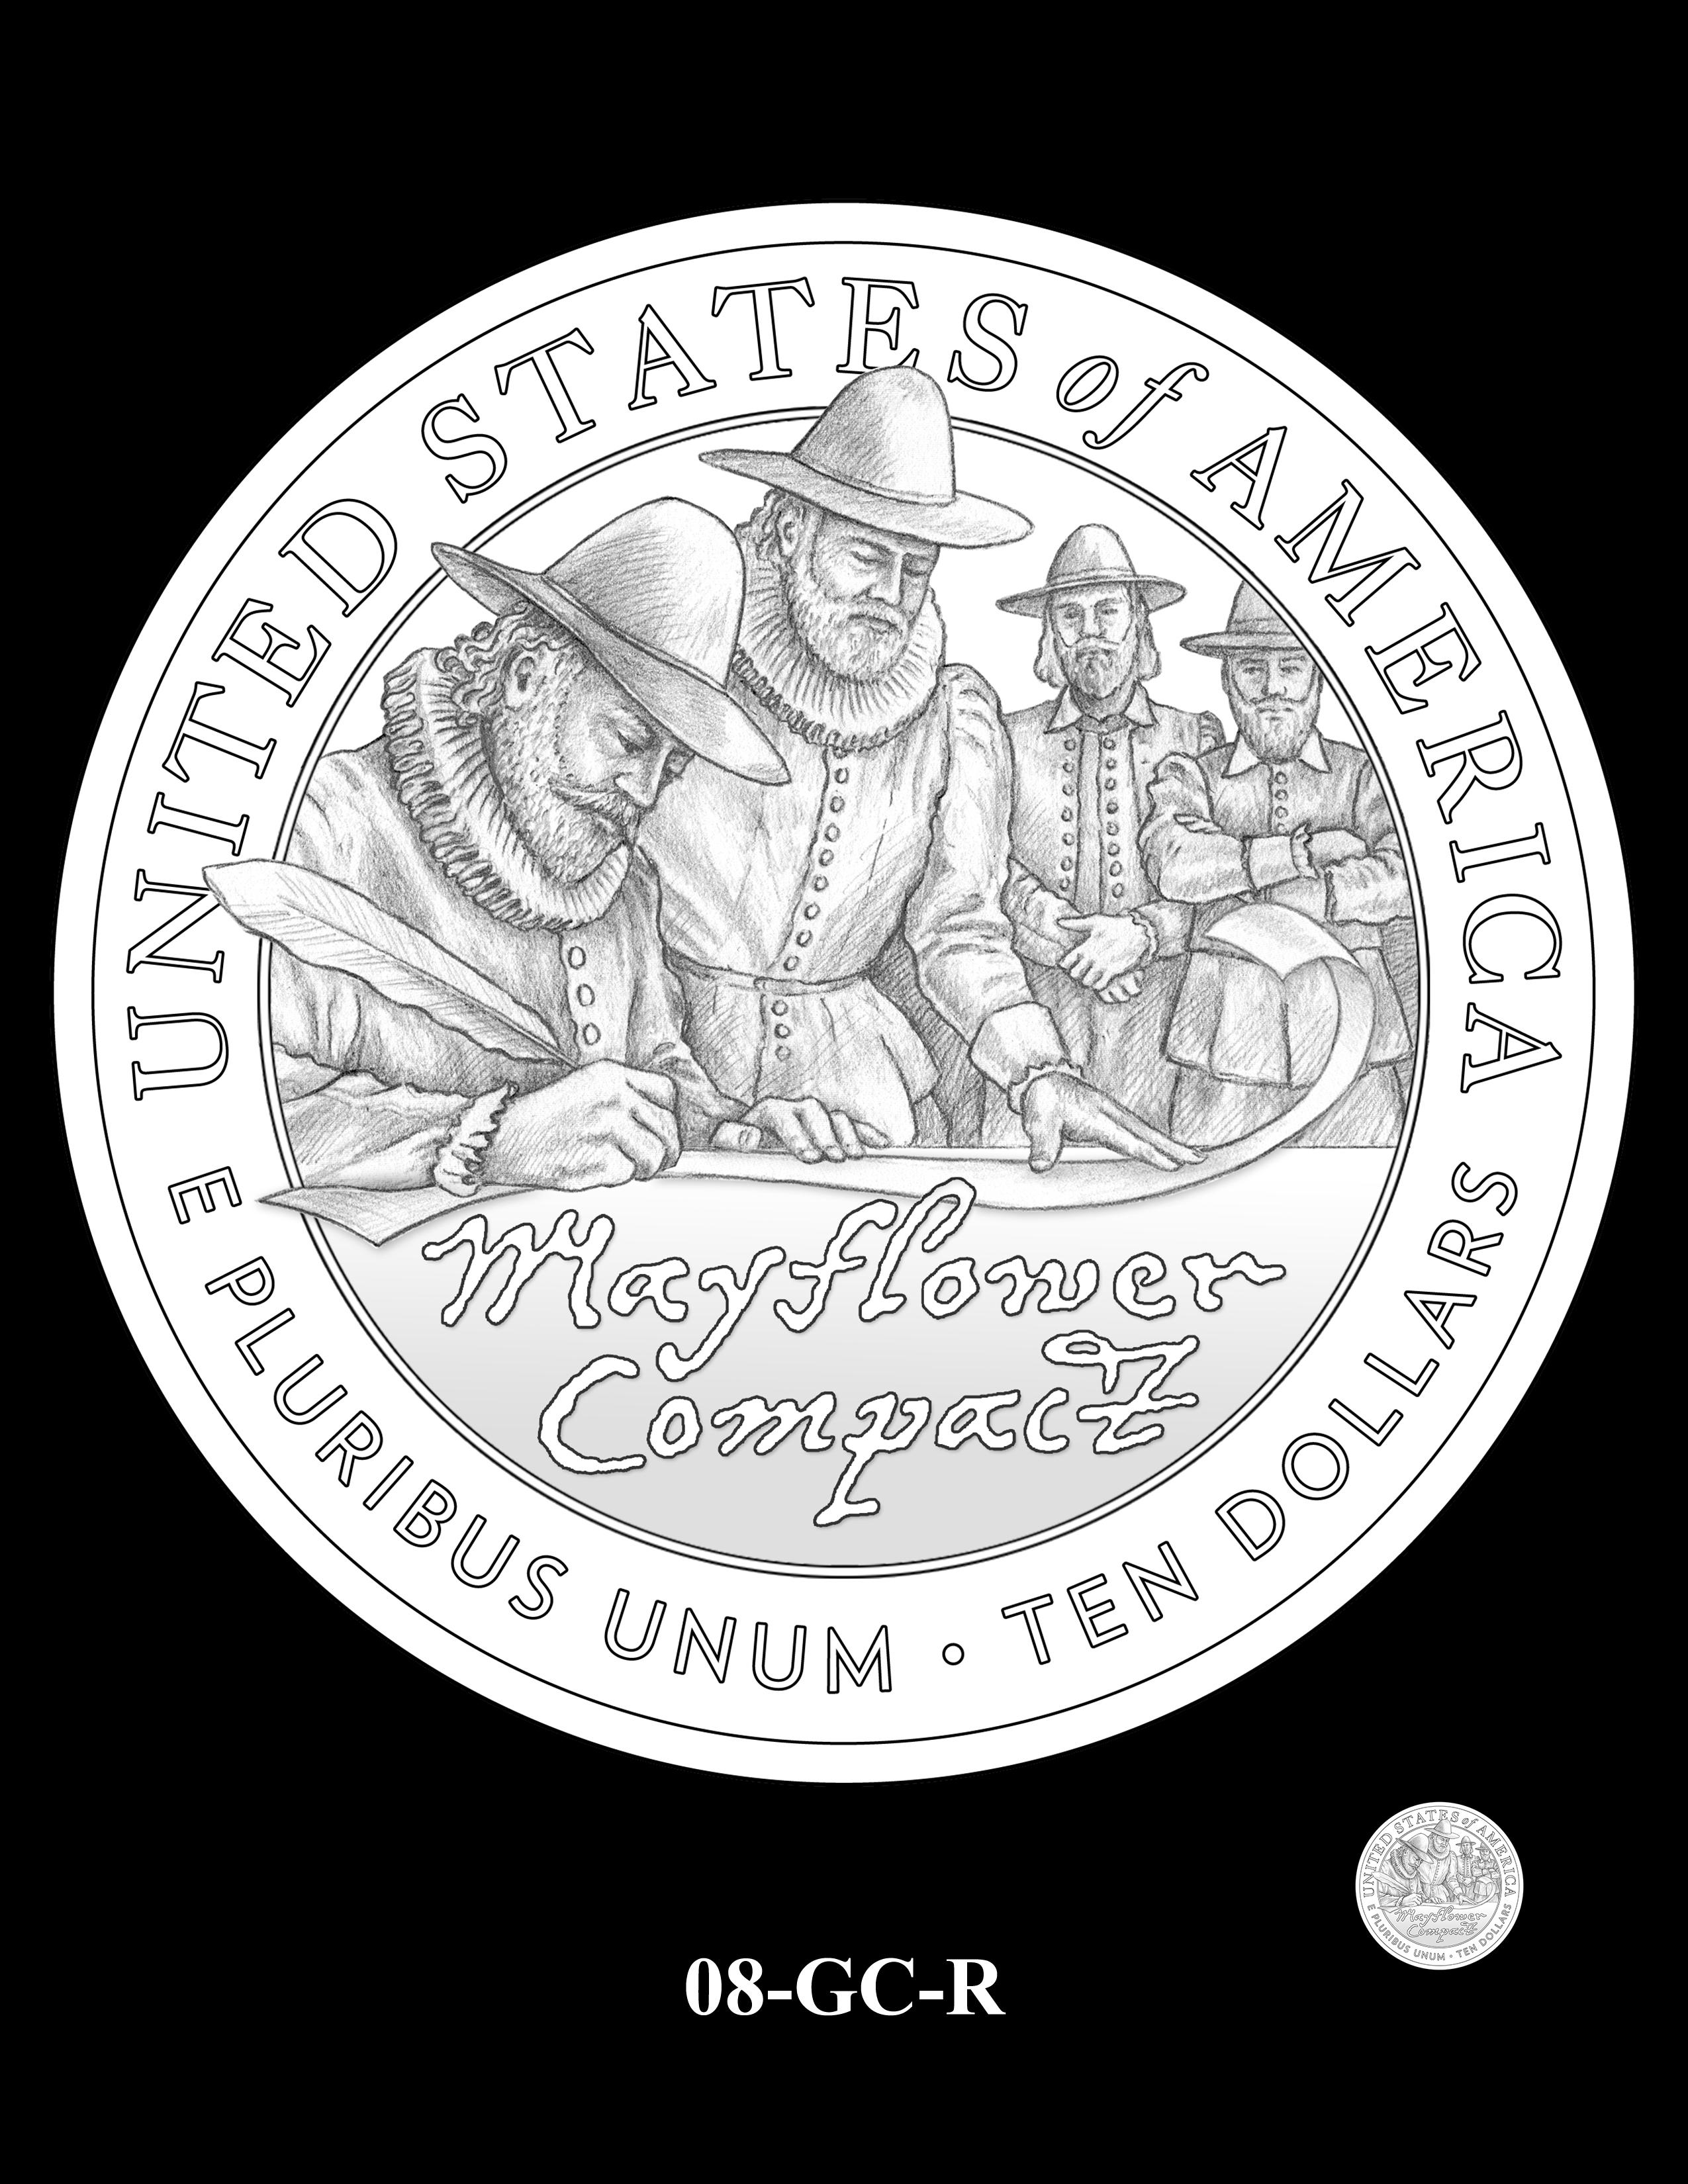 08-GC-R - 2020 Mayflower 400th Anniversary 24K Gold Coin & Silver Medal Program